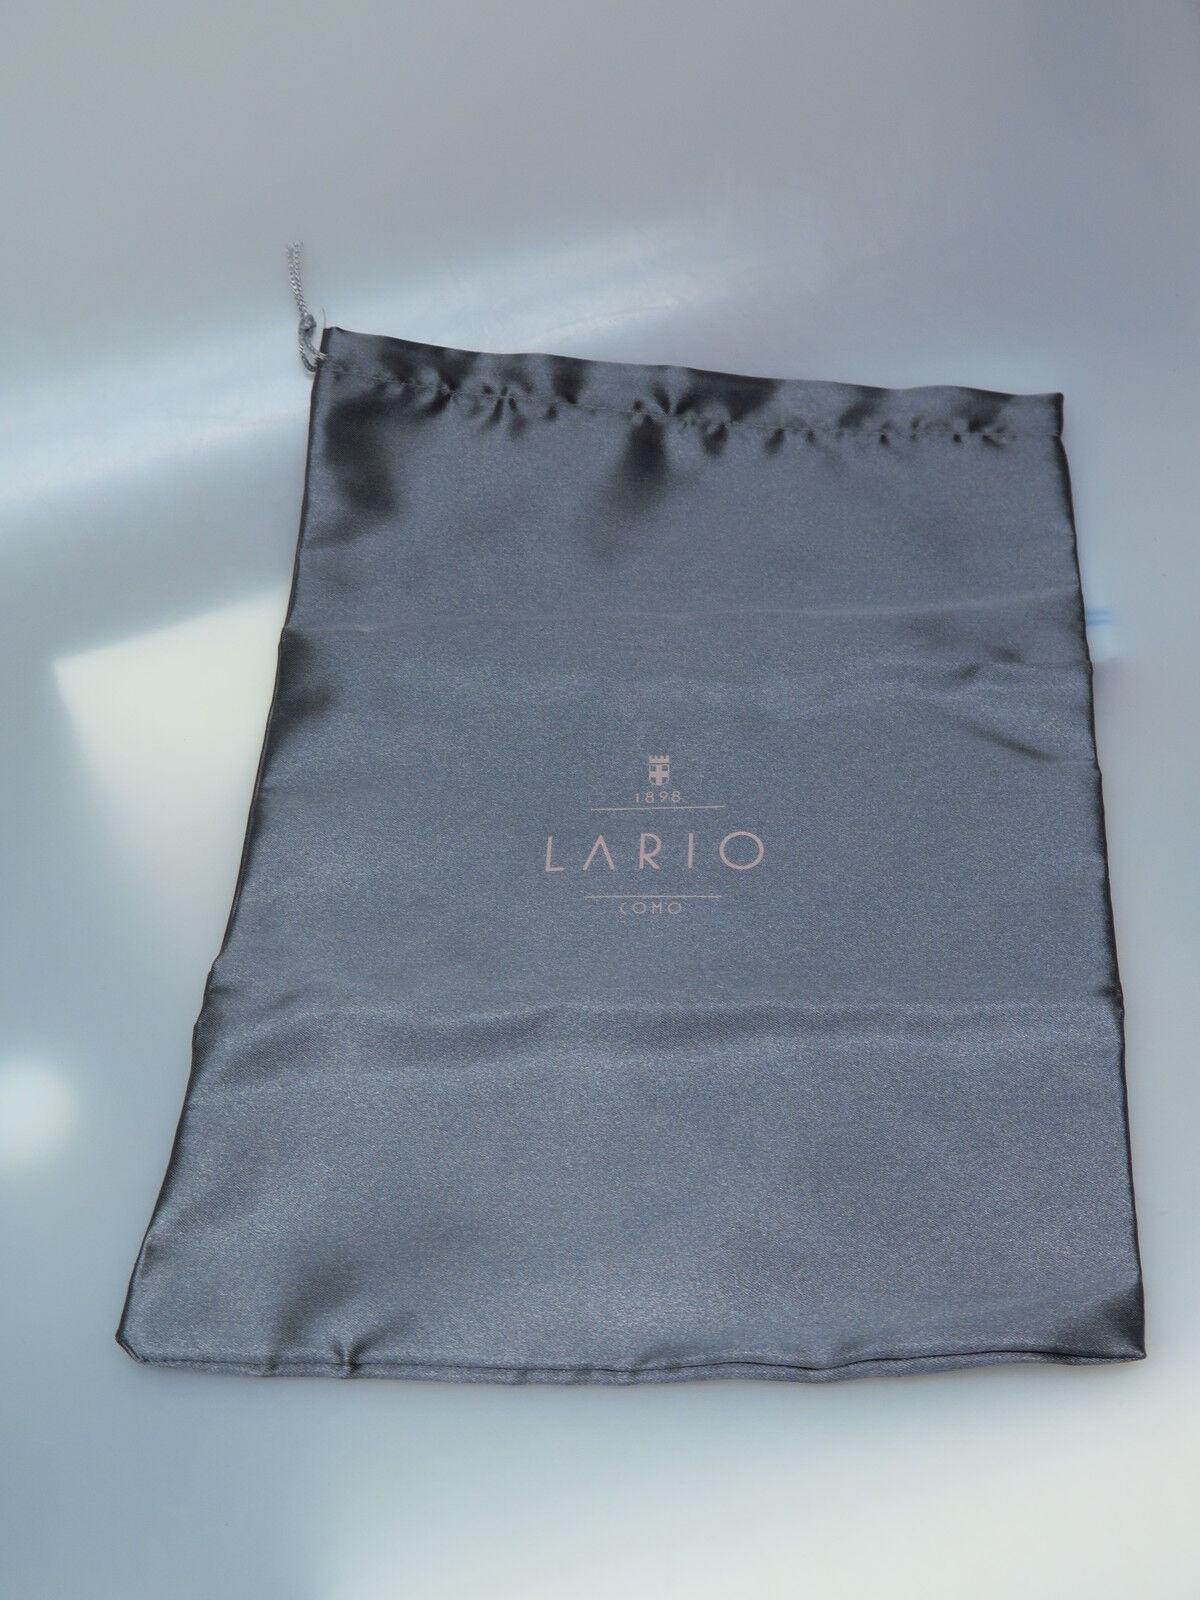 LARIO COMO 1898 Designer Damenschuhe LA D074A D074A D074A Diora Schwarz 36,5 NEU 3e5013